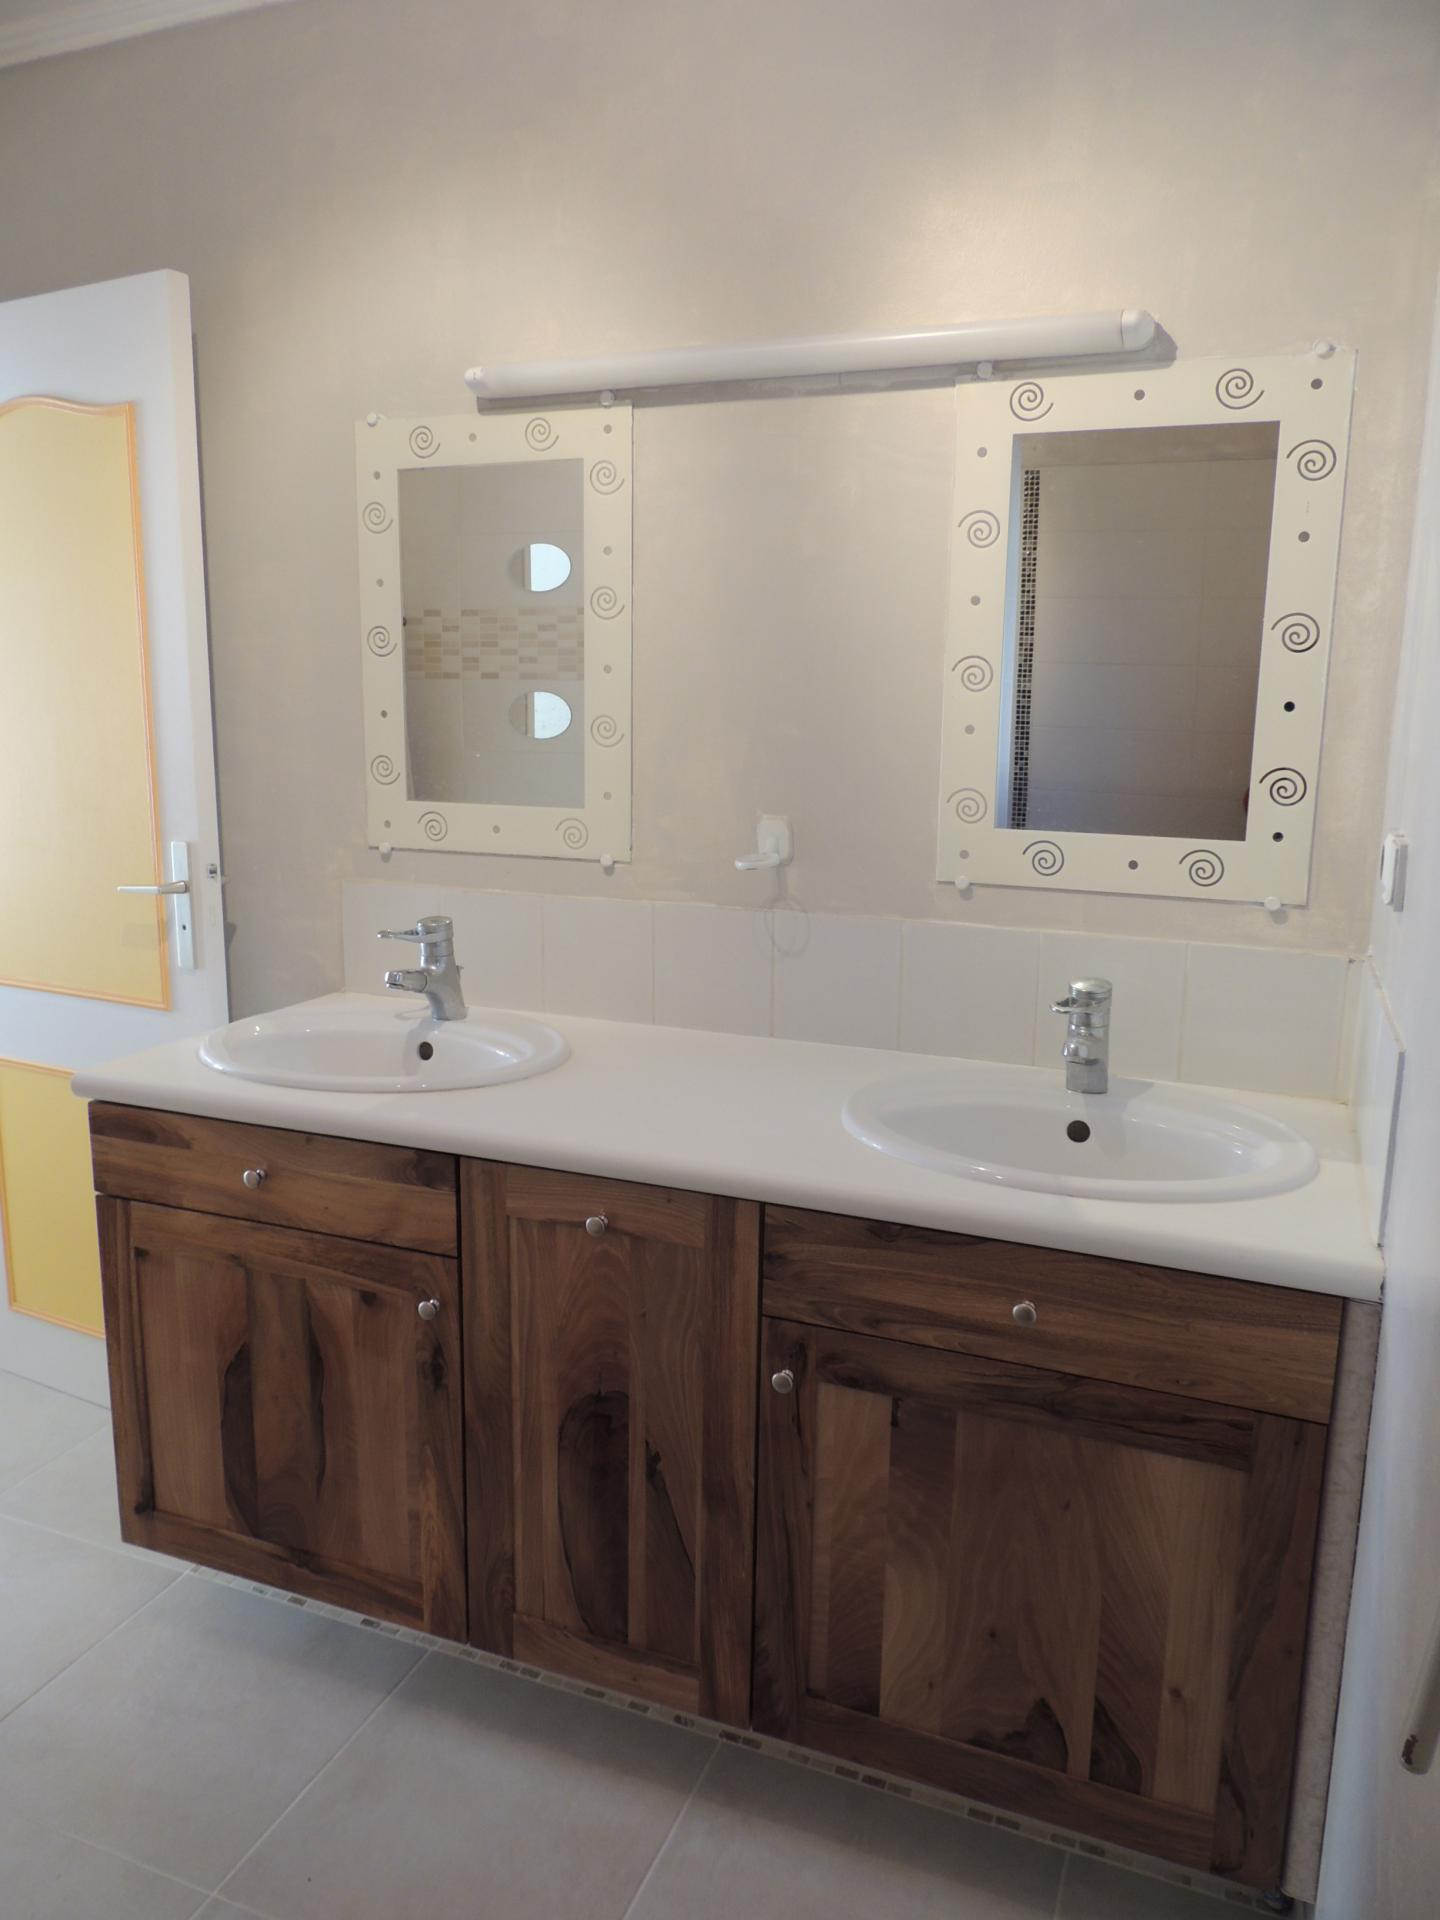 Salle de bain wc for Une salle de bain